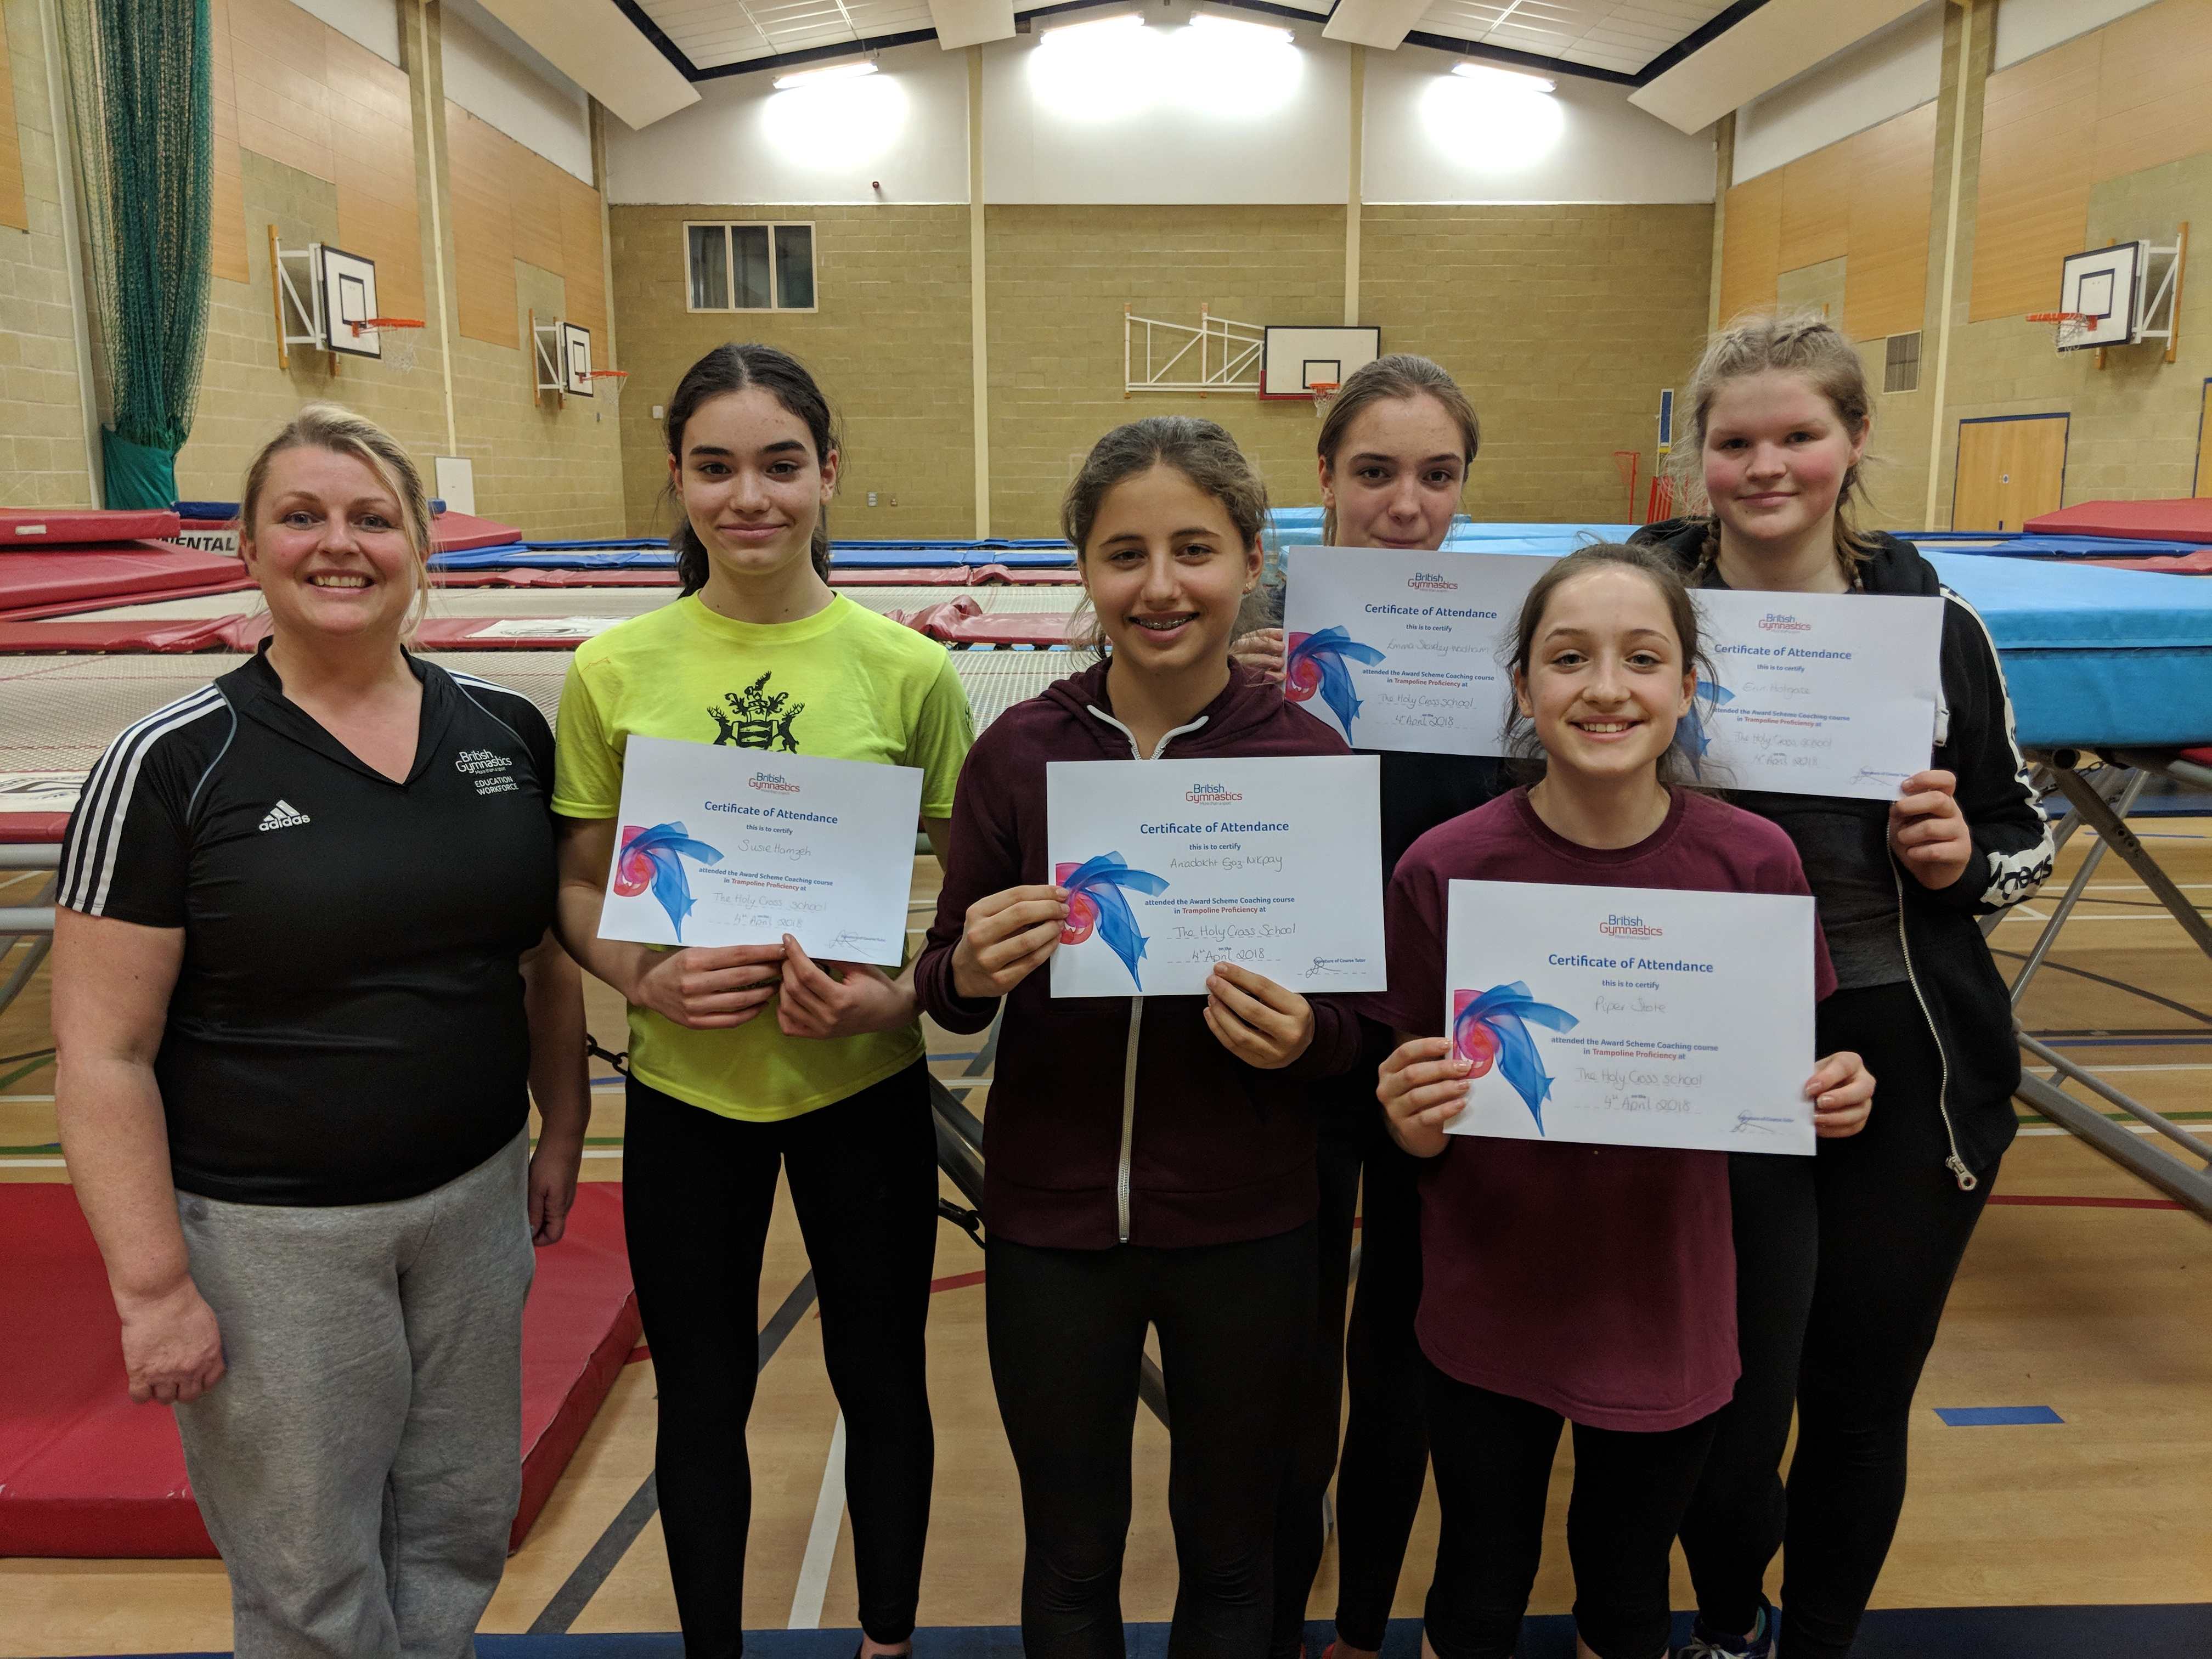 Award Scheme Coach March 2018 - Five new coaches complete theirBritish Gymnastics training